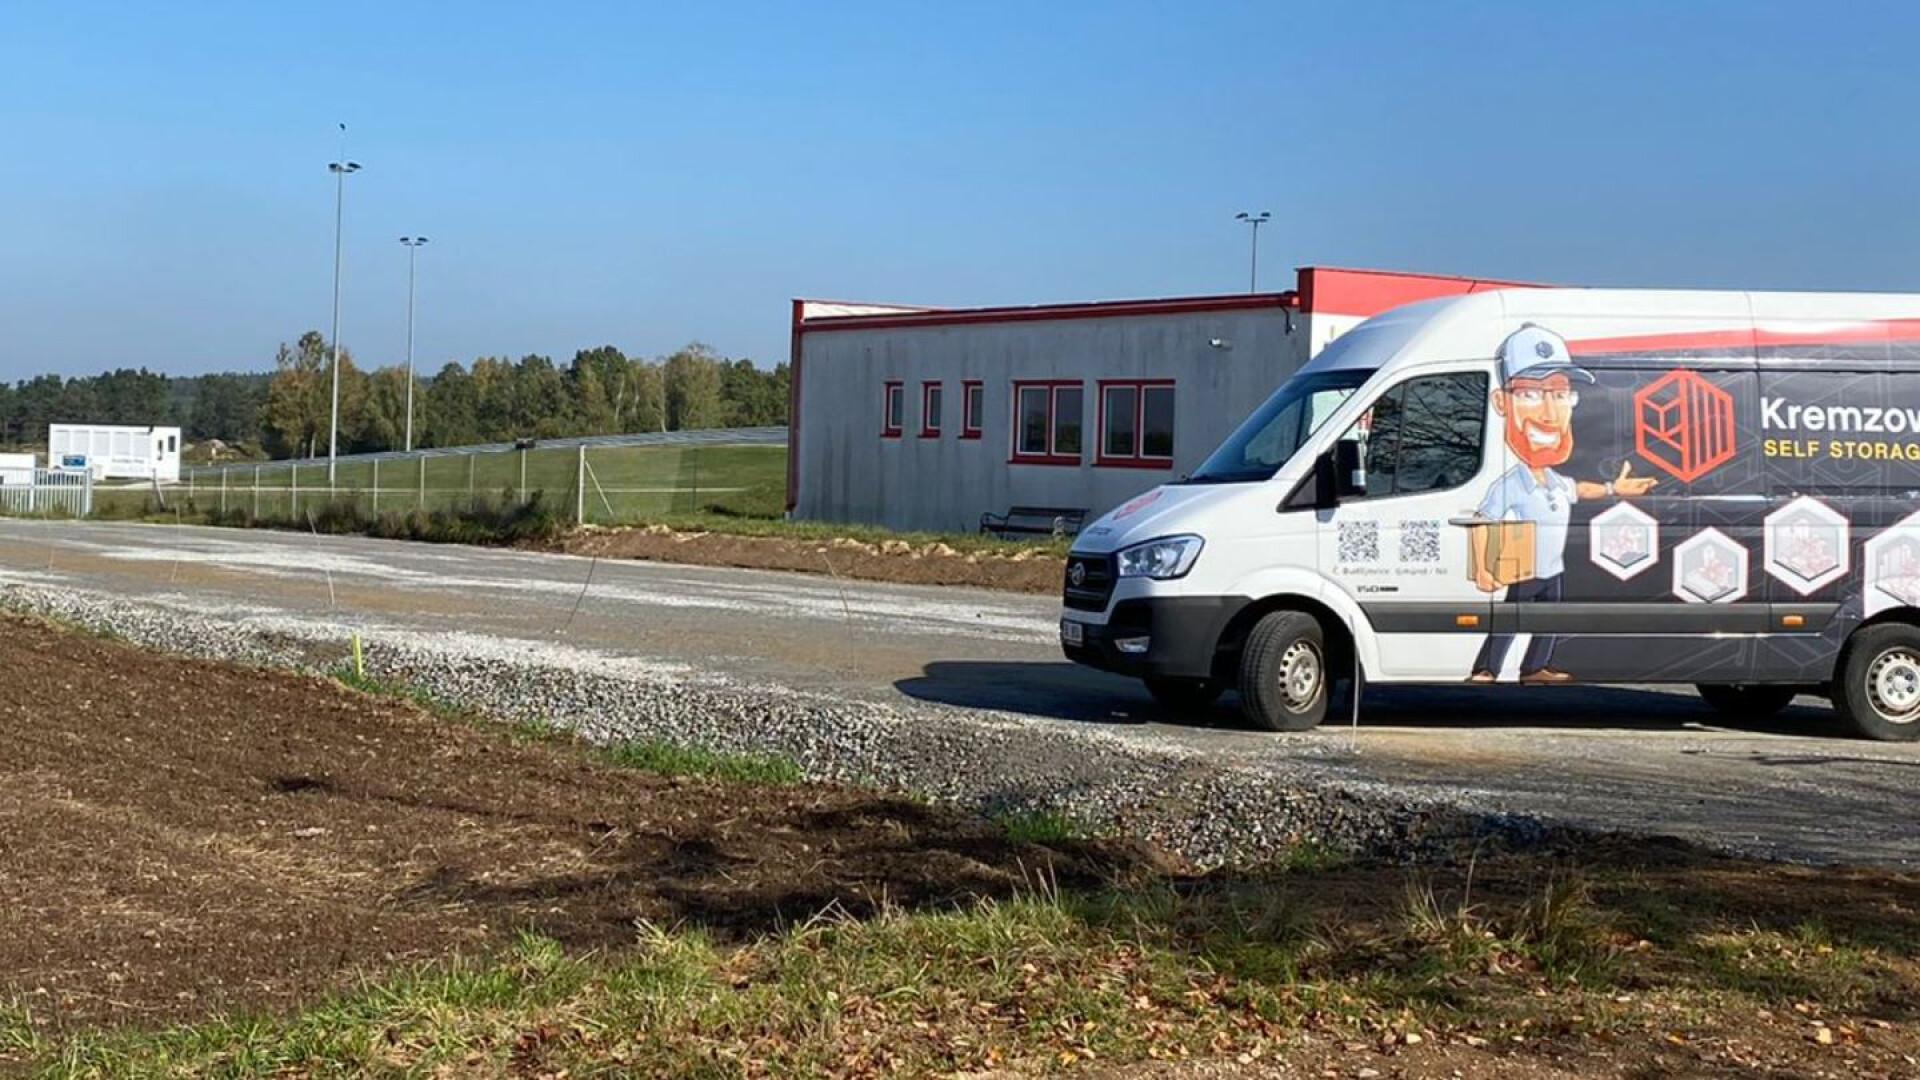 Gm-nd-Baustelle-im-Access-Park-Erstes-Mietlager-kommt